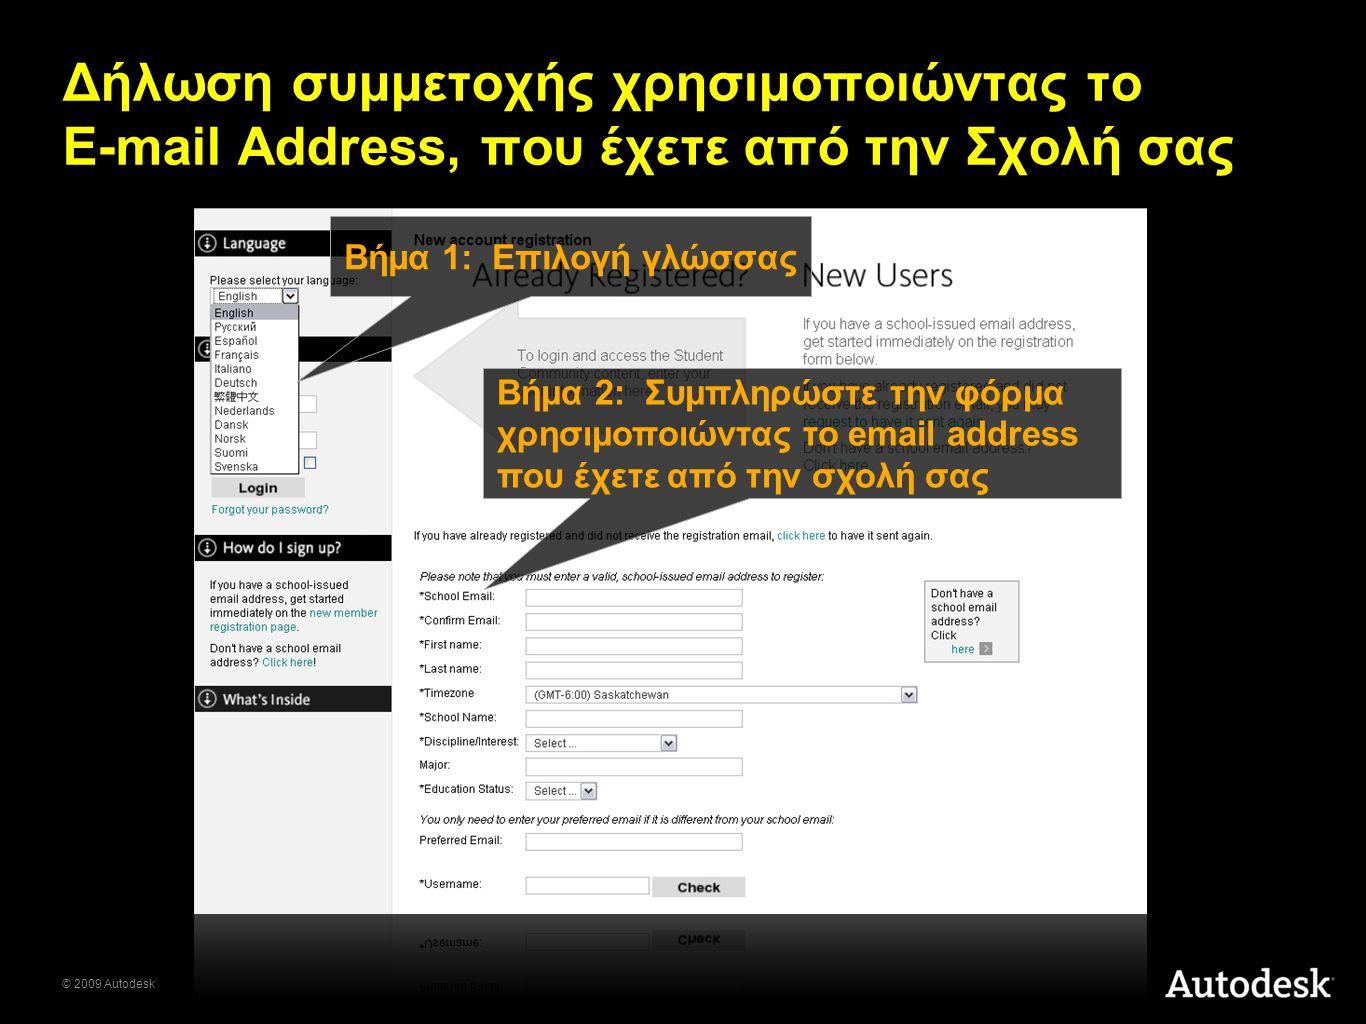 © 2009 Autodesk Βήμα 1: Επιλογή γλώσσας Βήμα 2: Συμπληρώστε την φόρμα χρησιμοποιώντας το email address που έχετε από την σχολή σας Δήλωση συμμετοχής χ